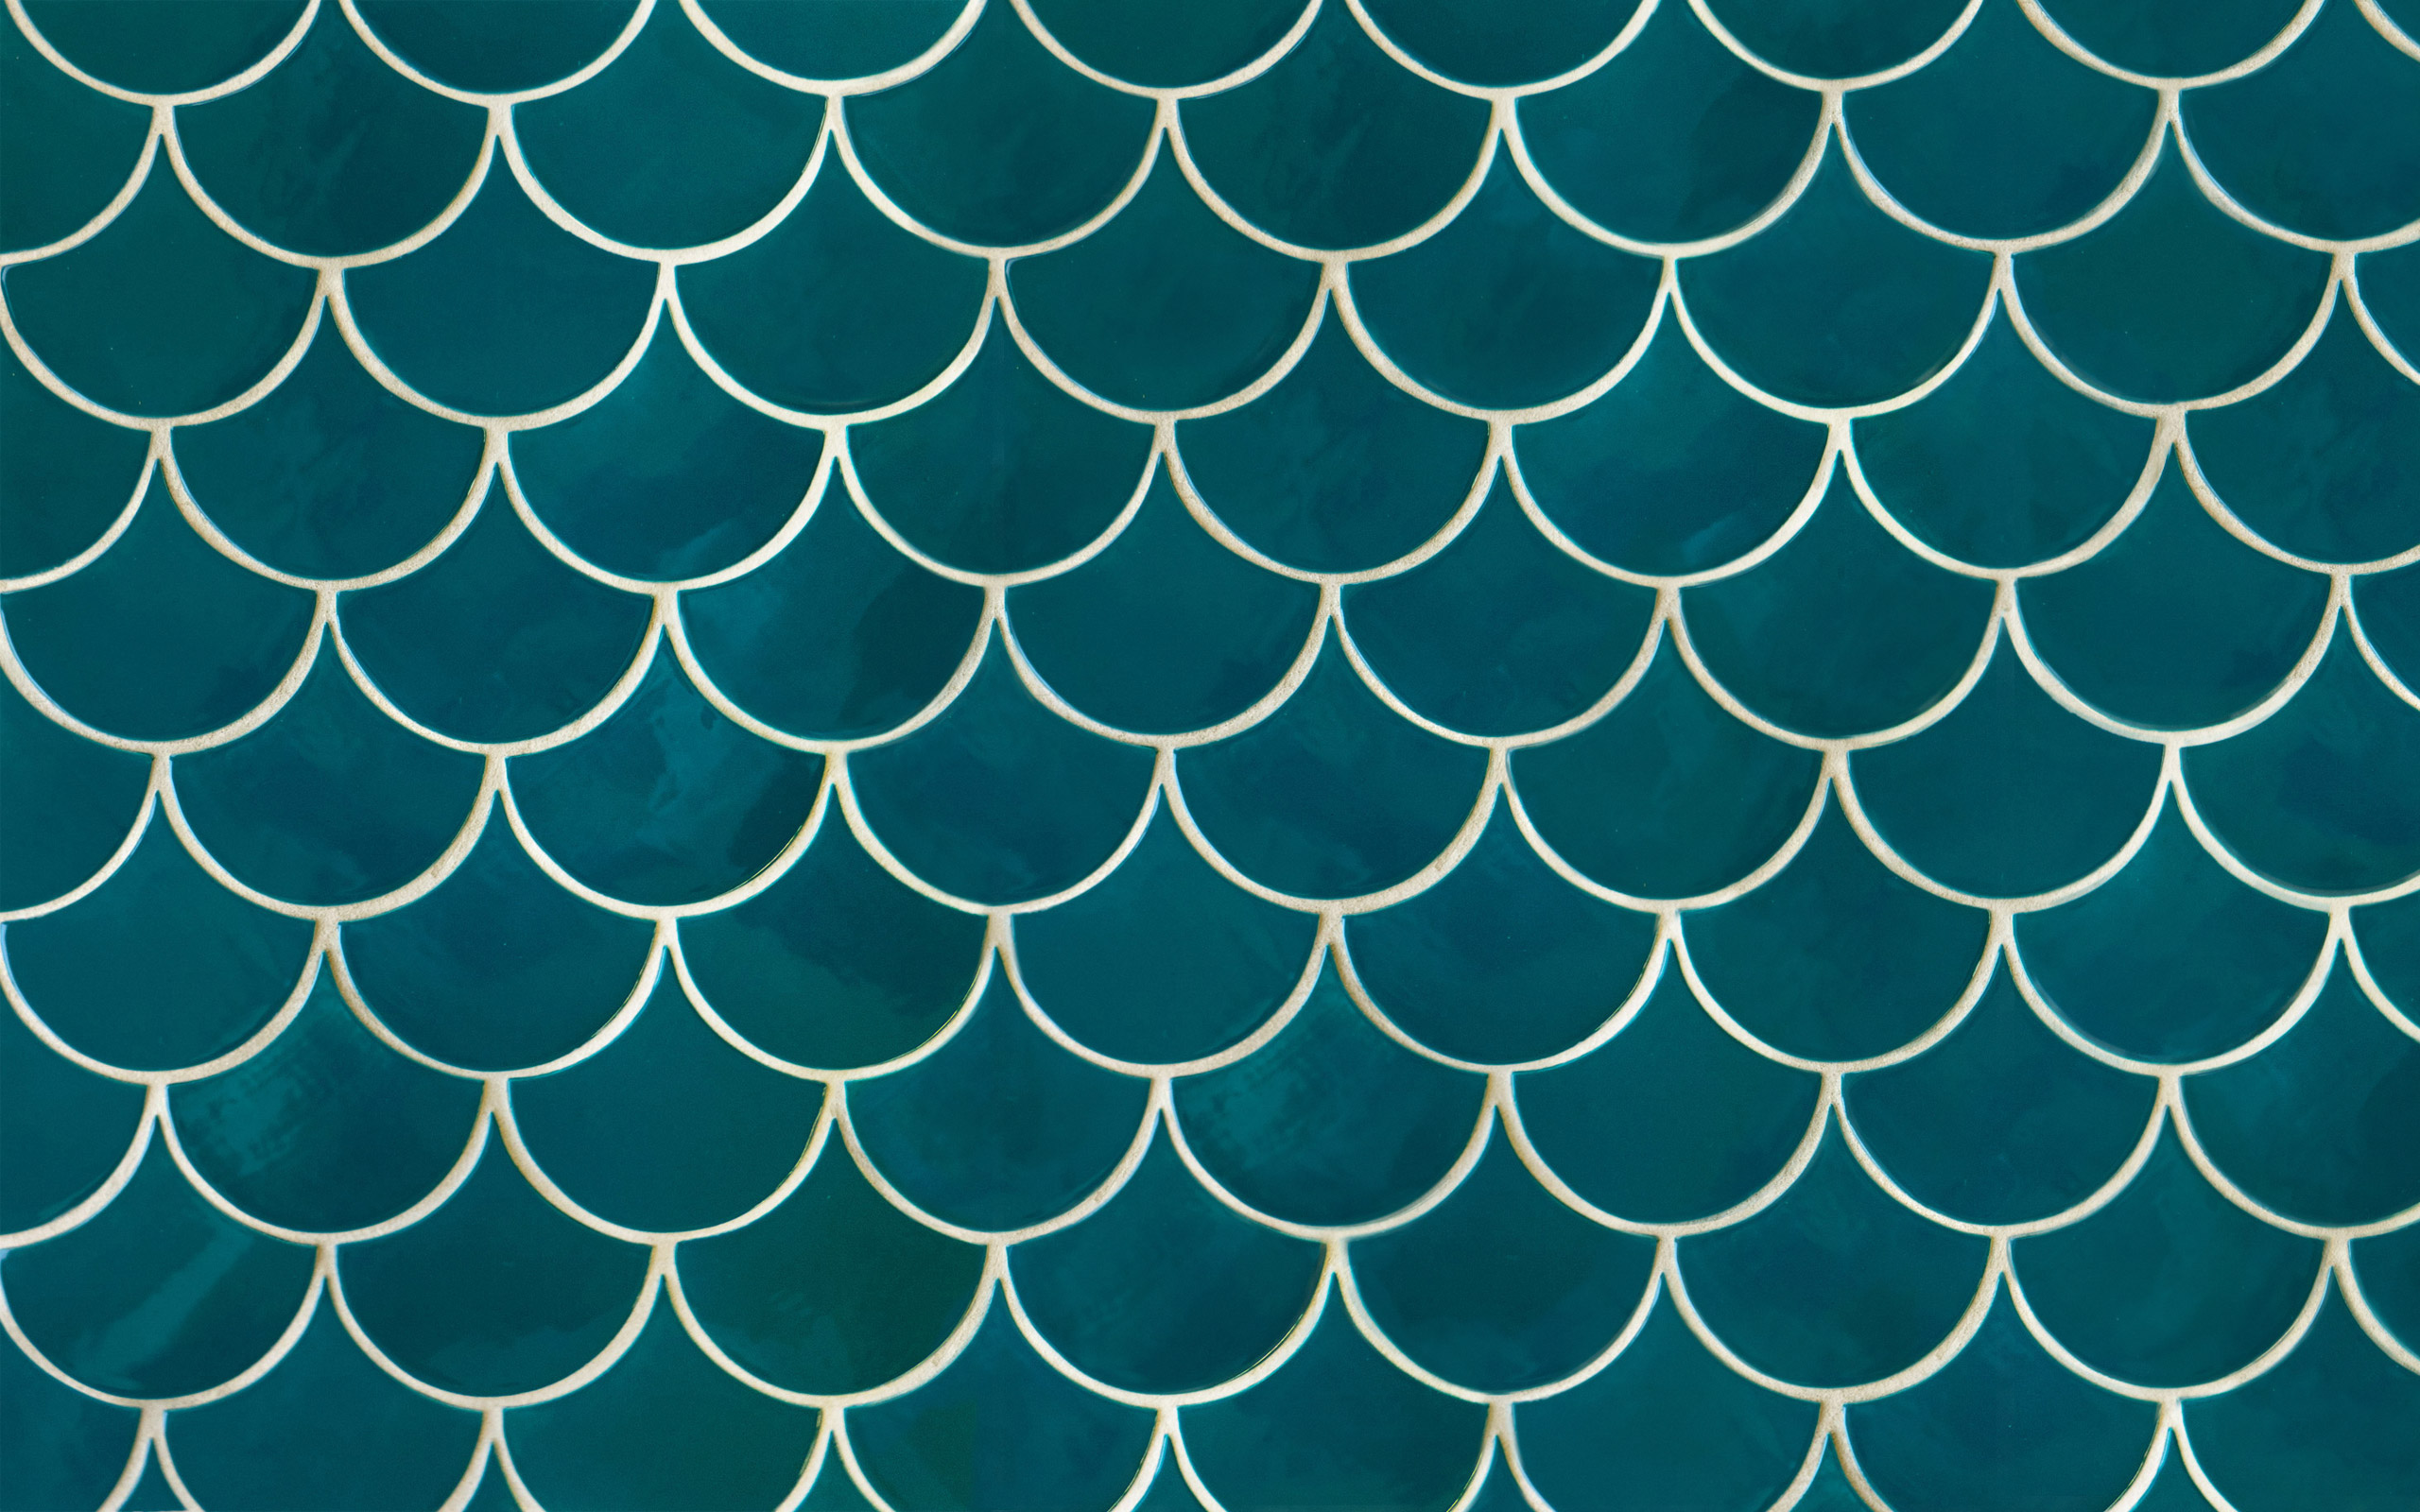 Lanterns Wallpaper Hd Moroccan Backgrounds Pixelstalk Net